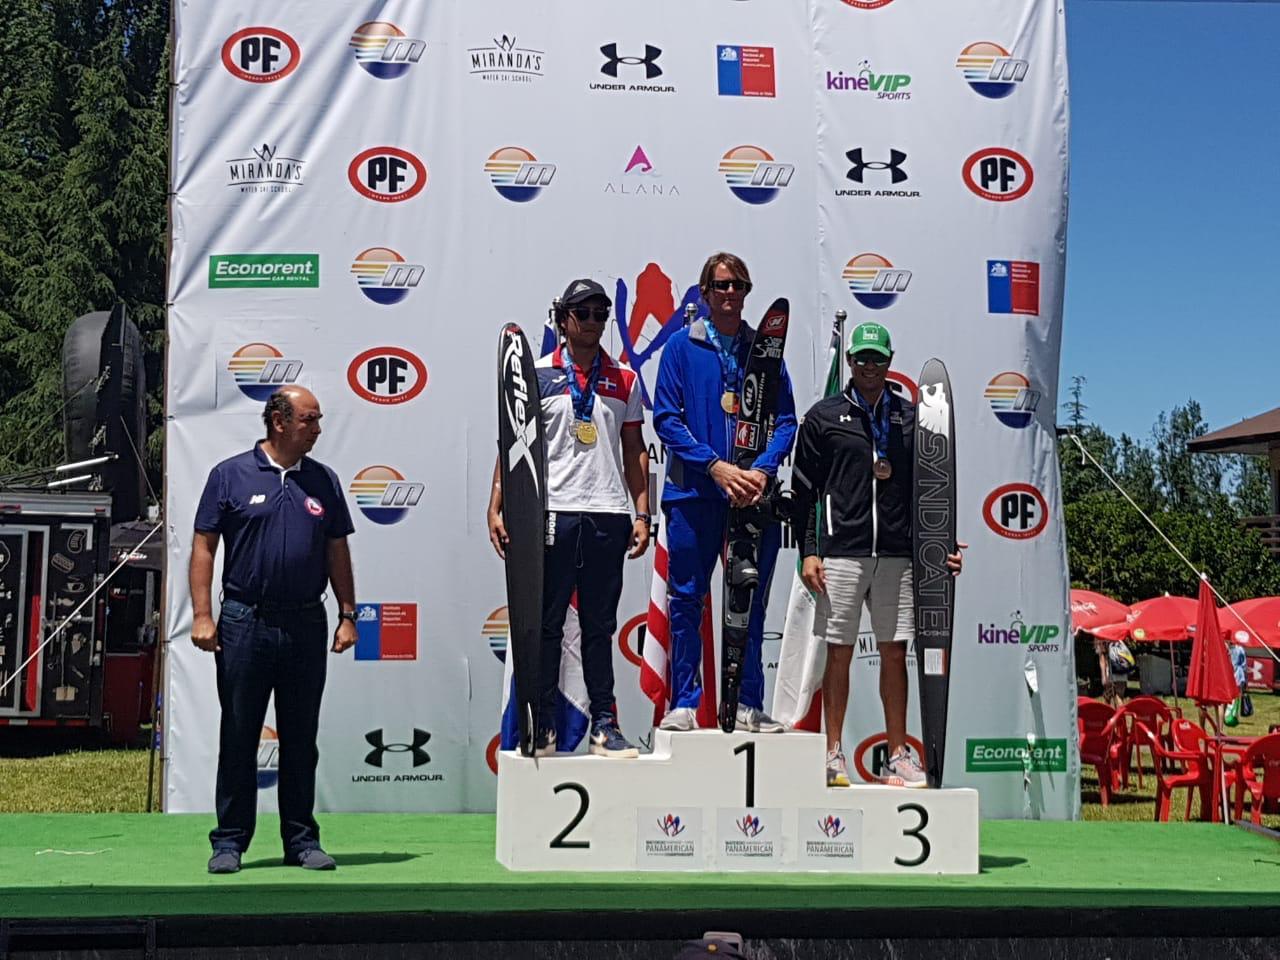 Esquiador Robert Pigozzi clasifica a Juegos Panamericanos Lima 2019